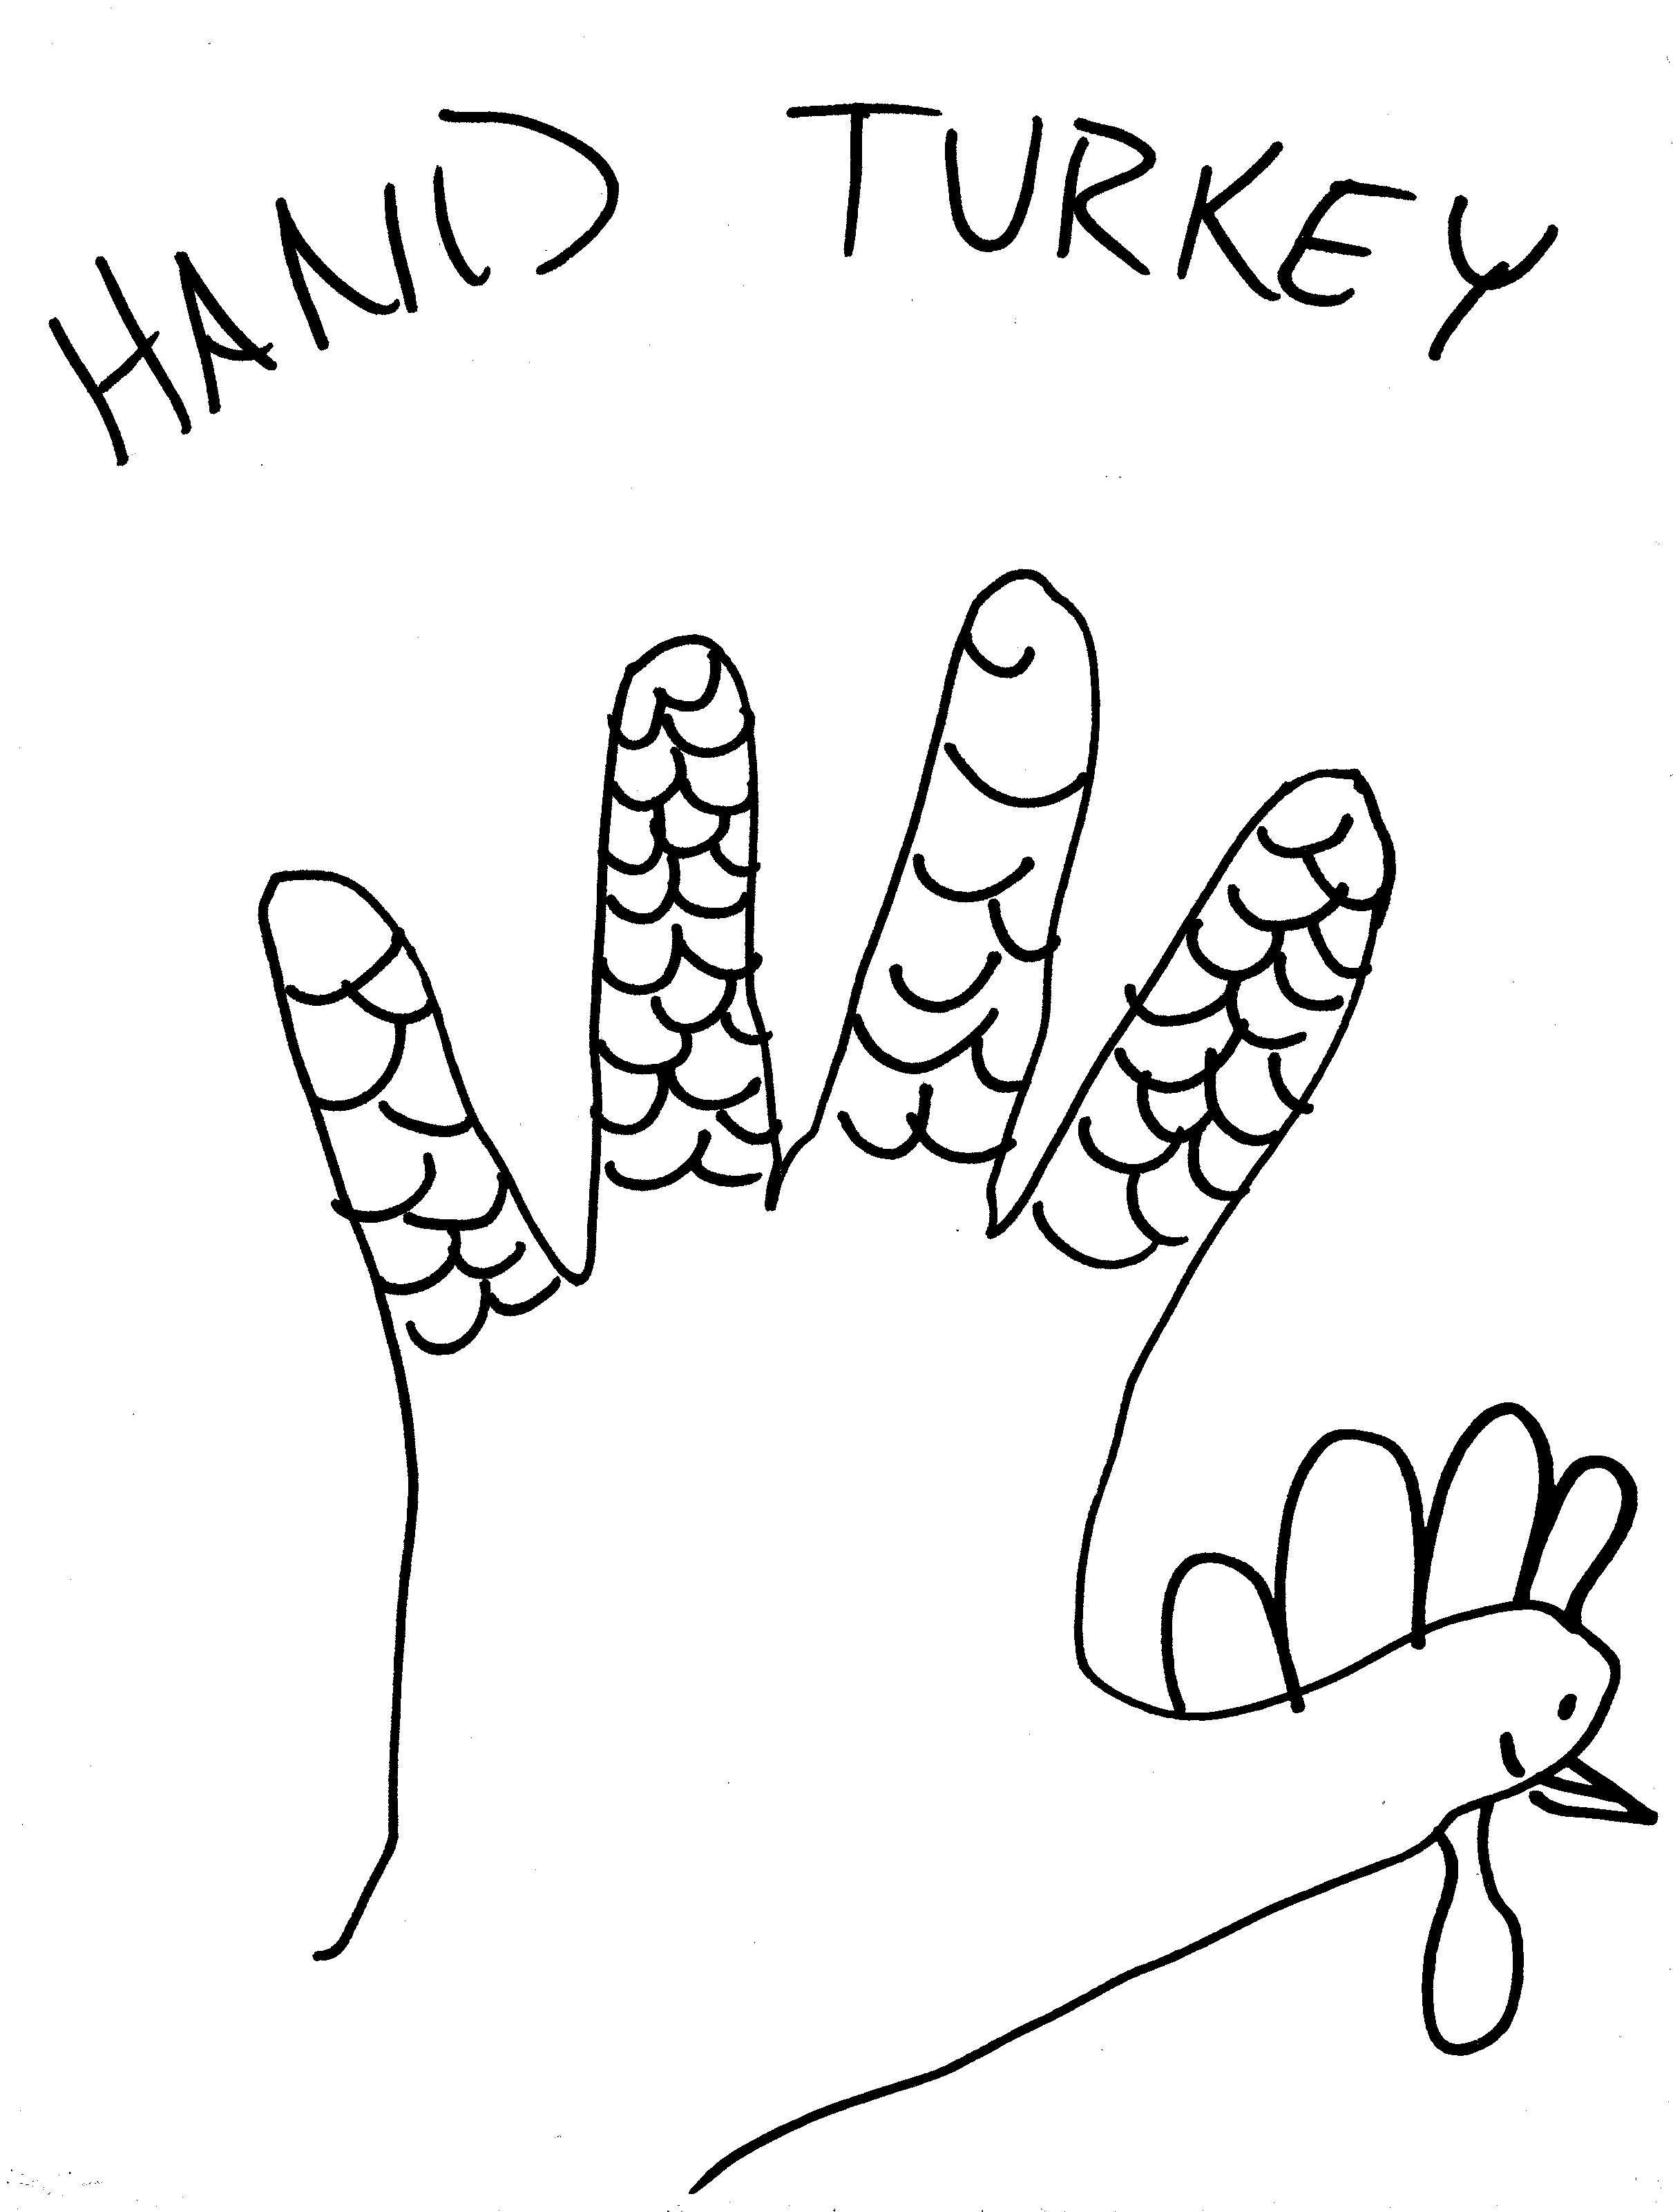 2422x3202 Day 293 Hand Turkey Making Made